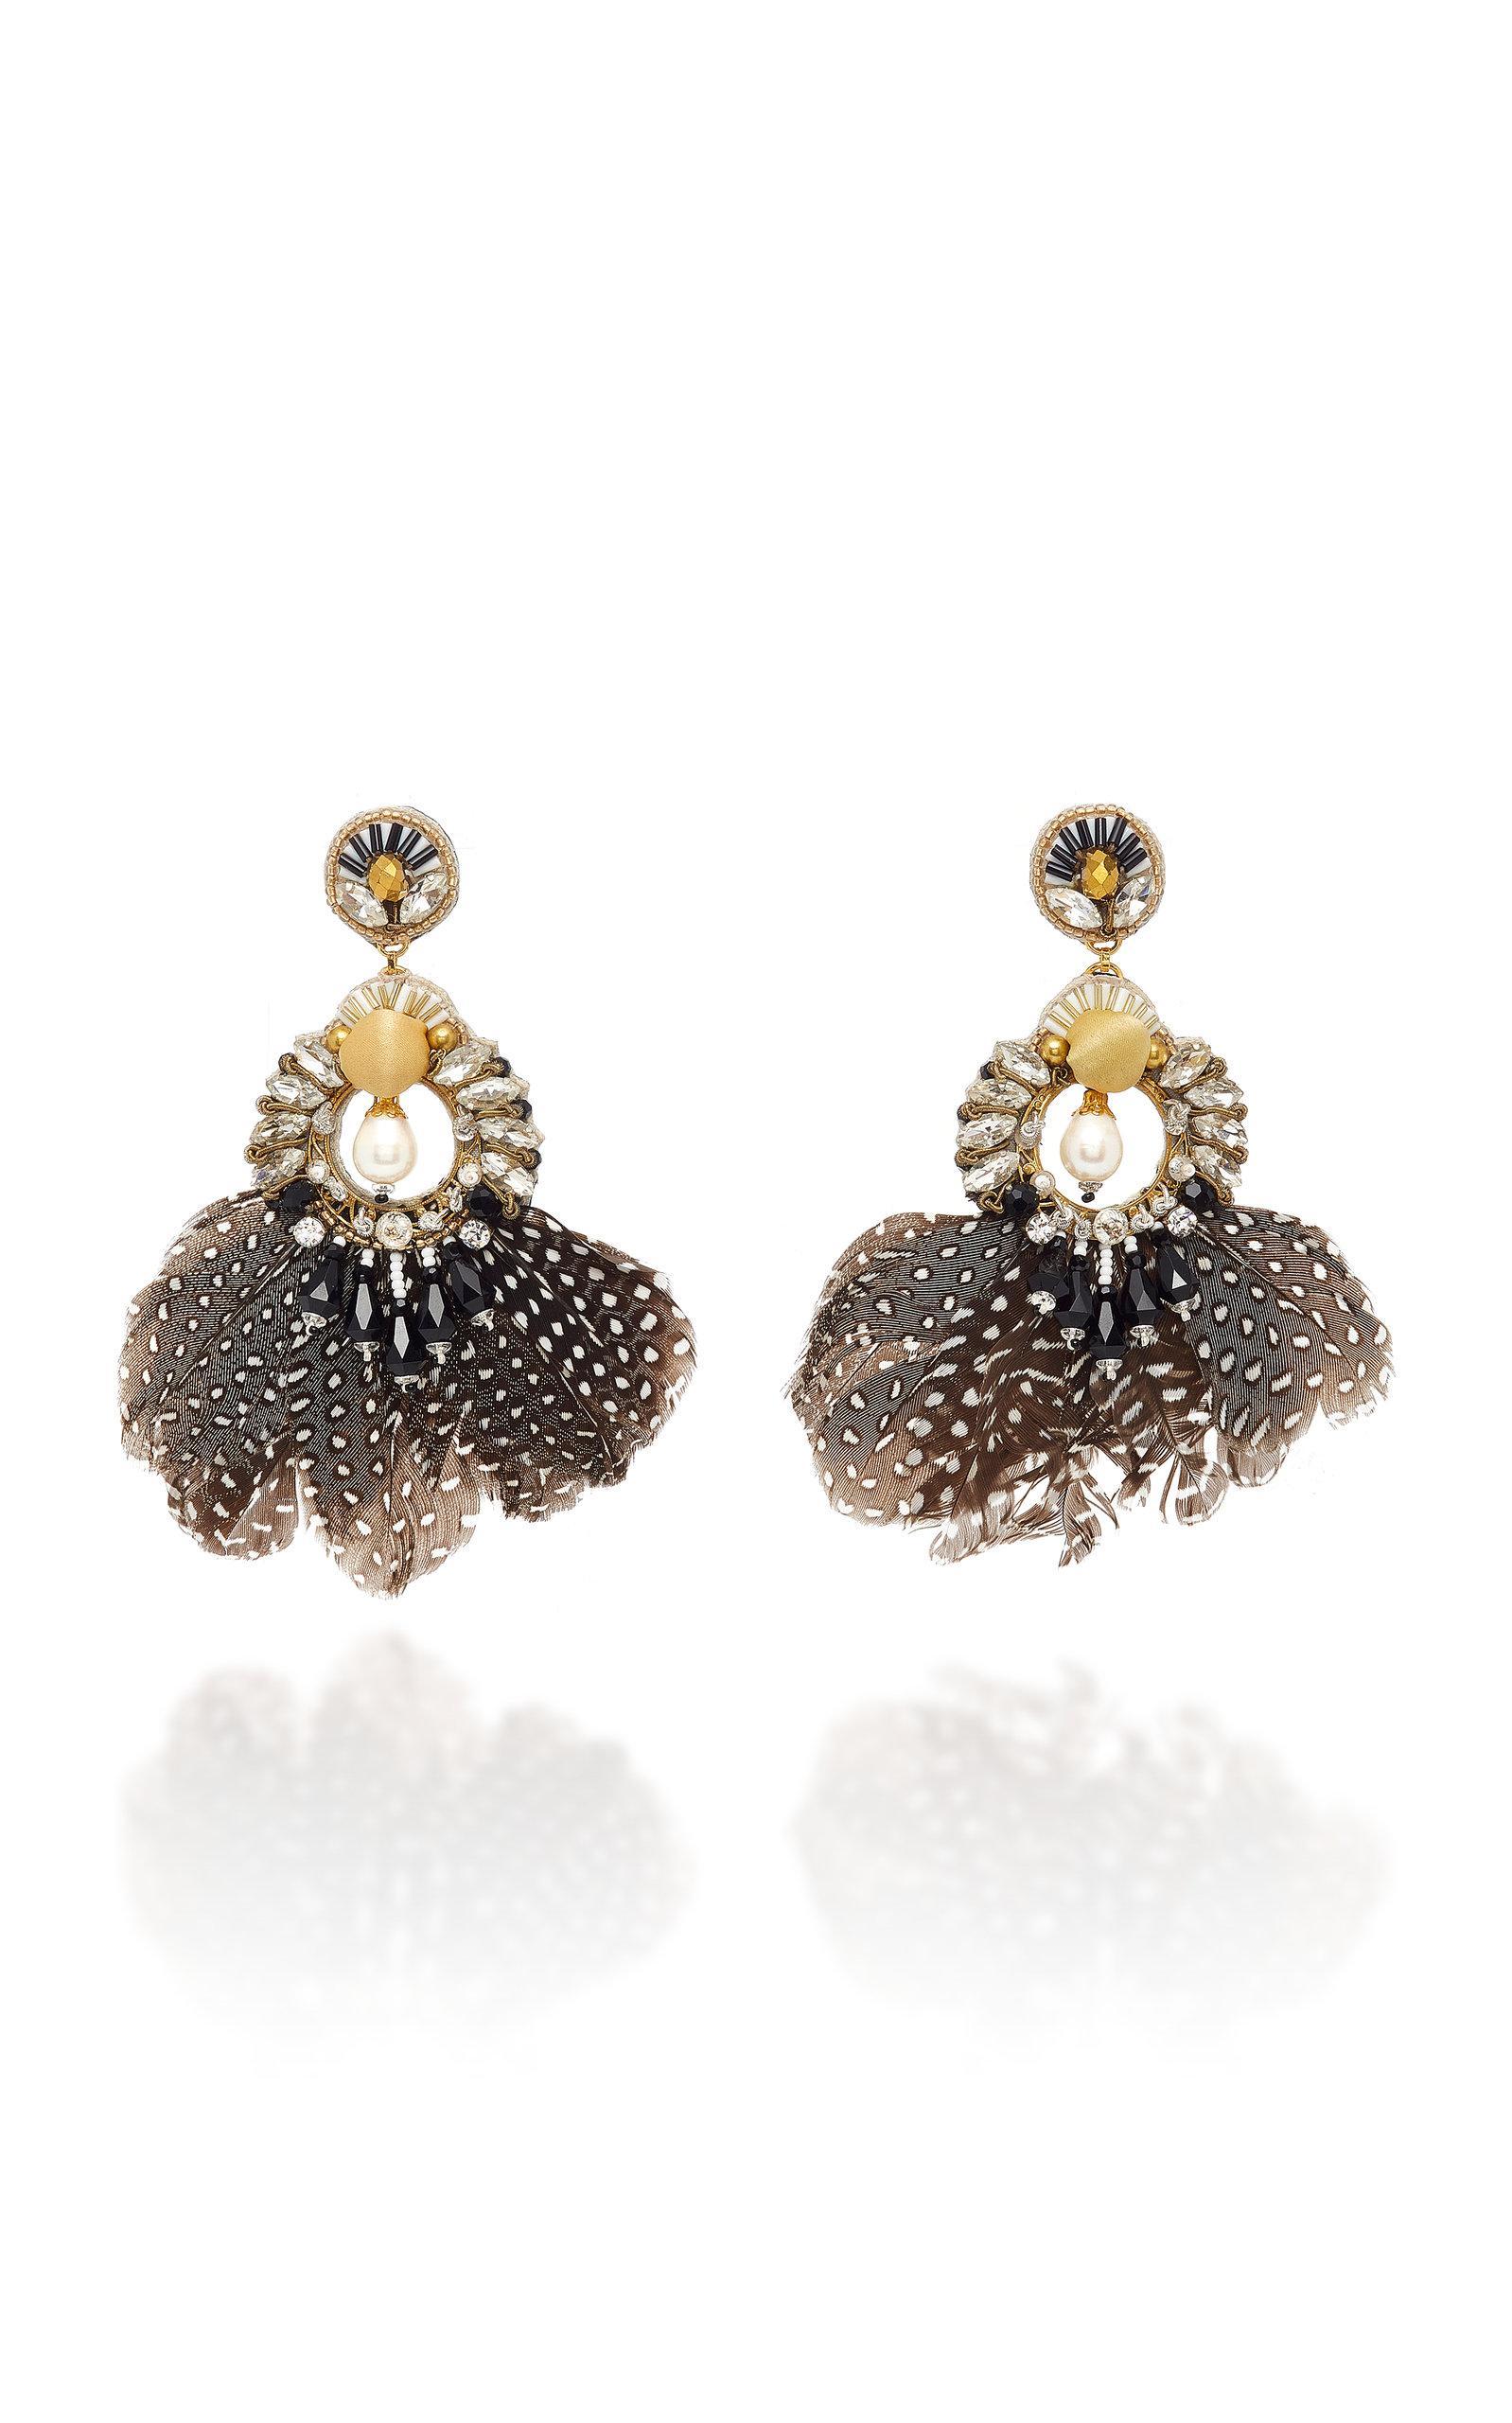 Ranjana Khan Carambola Pearl And Feather Gold-tone Drop Earrings In Black